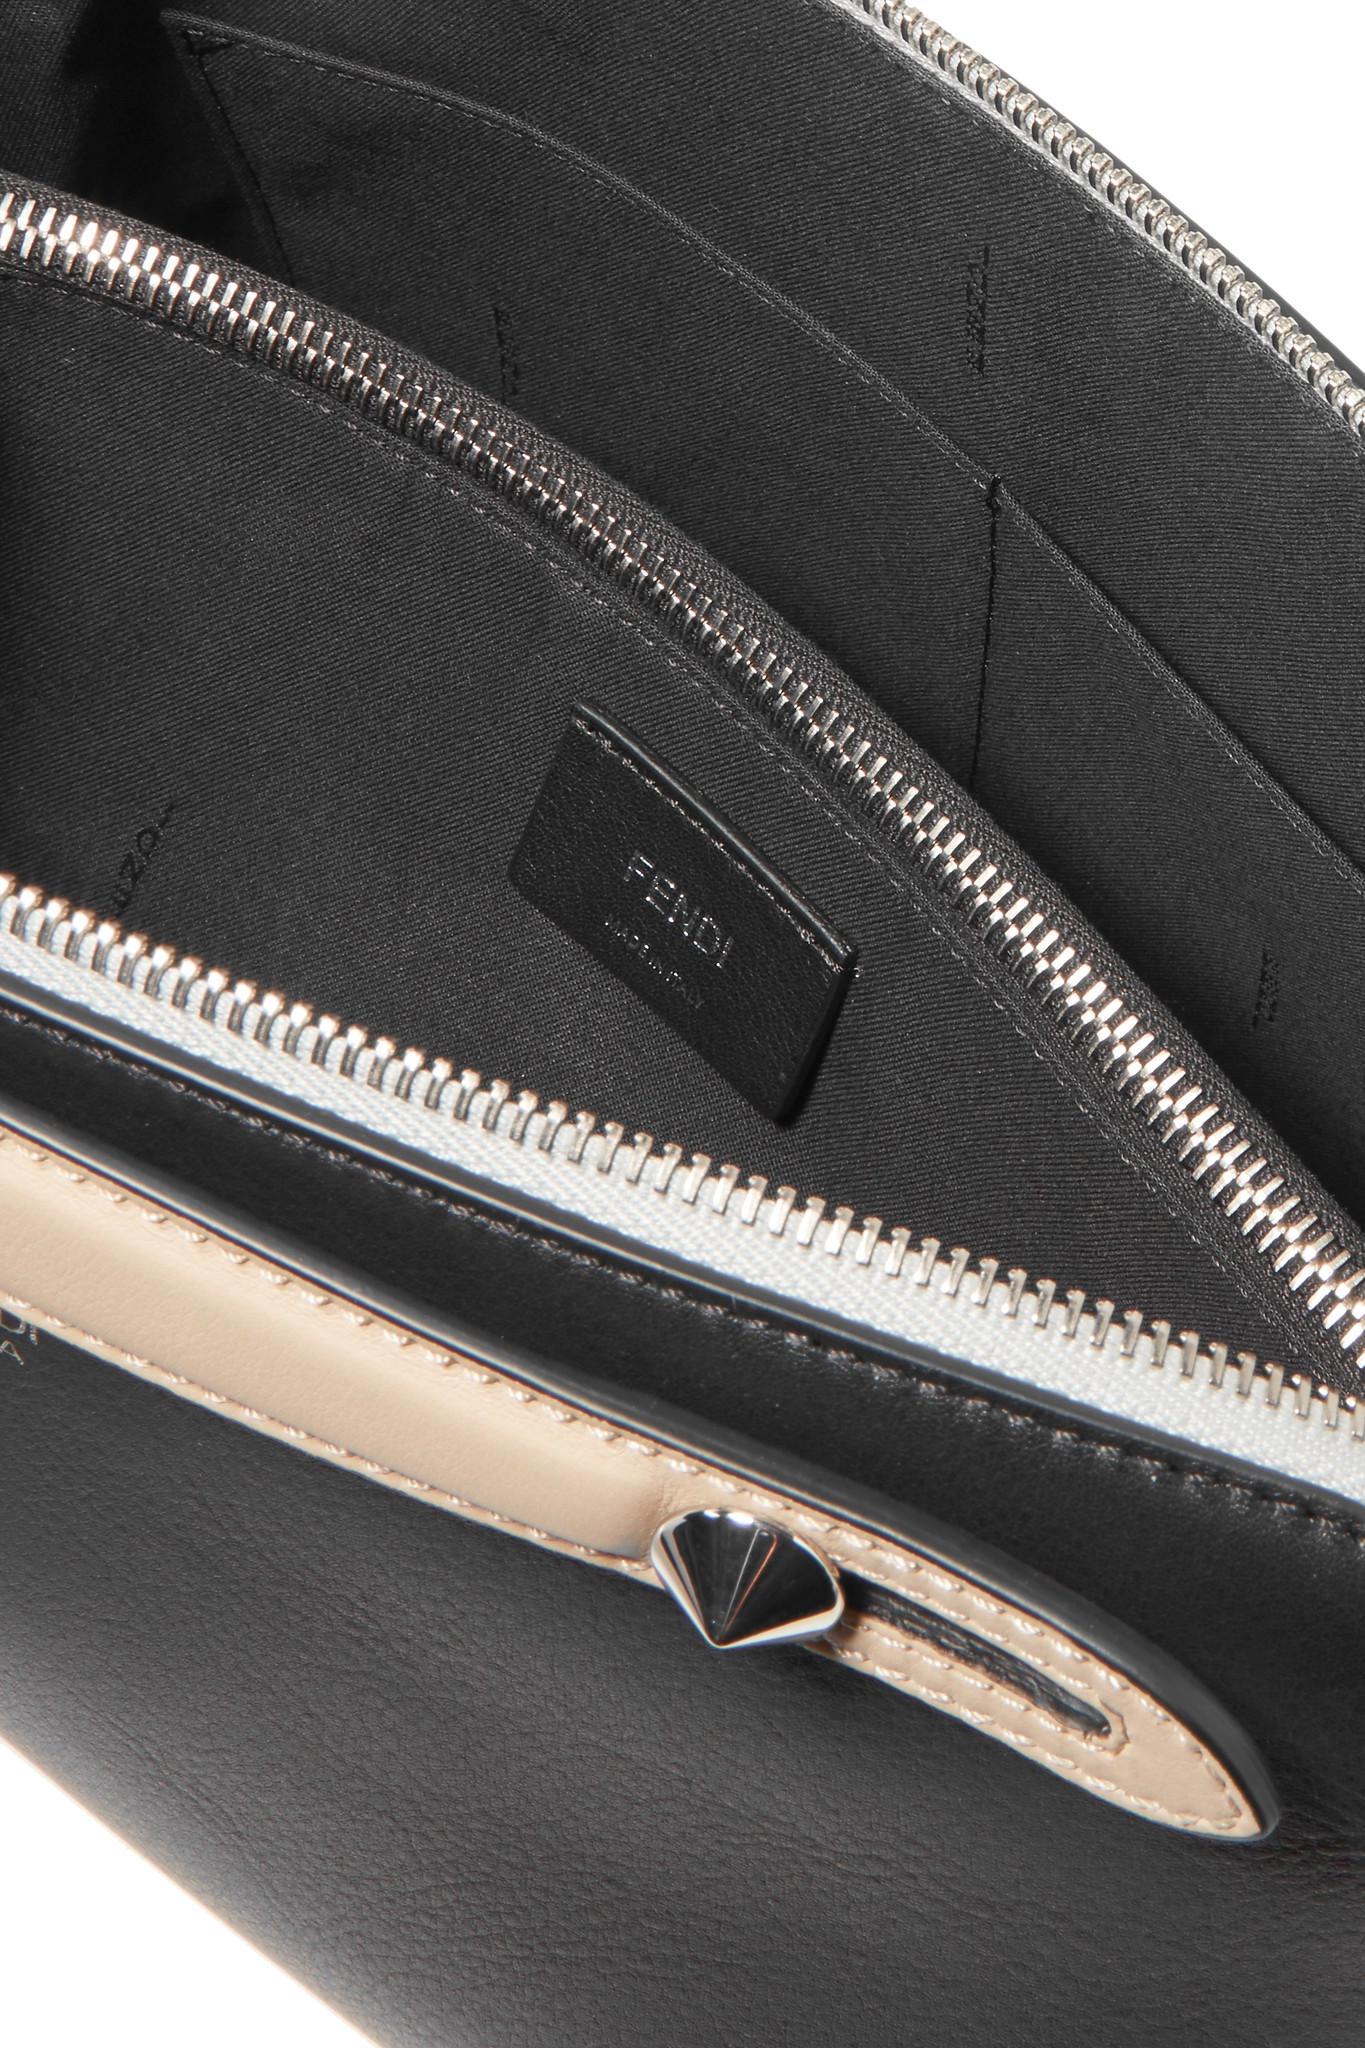 5de33f4a460a Fendi - Black By The Way Small Color-block Textured-leather Shoulder Bag -.  View fullscreen